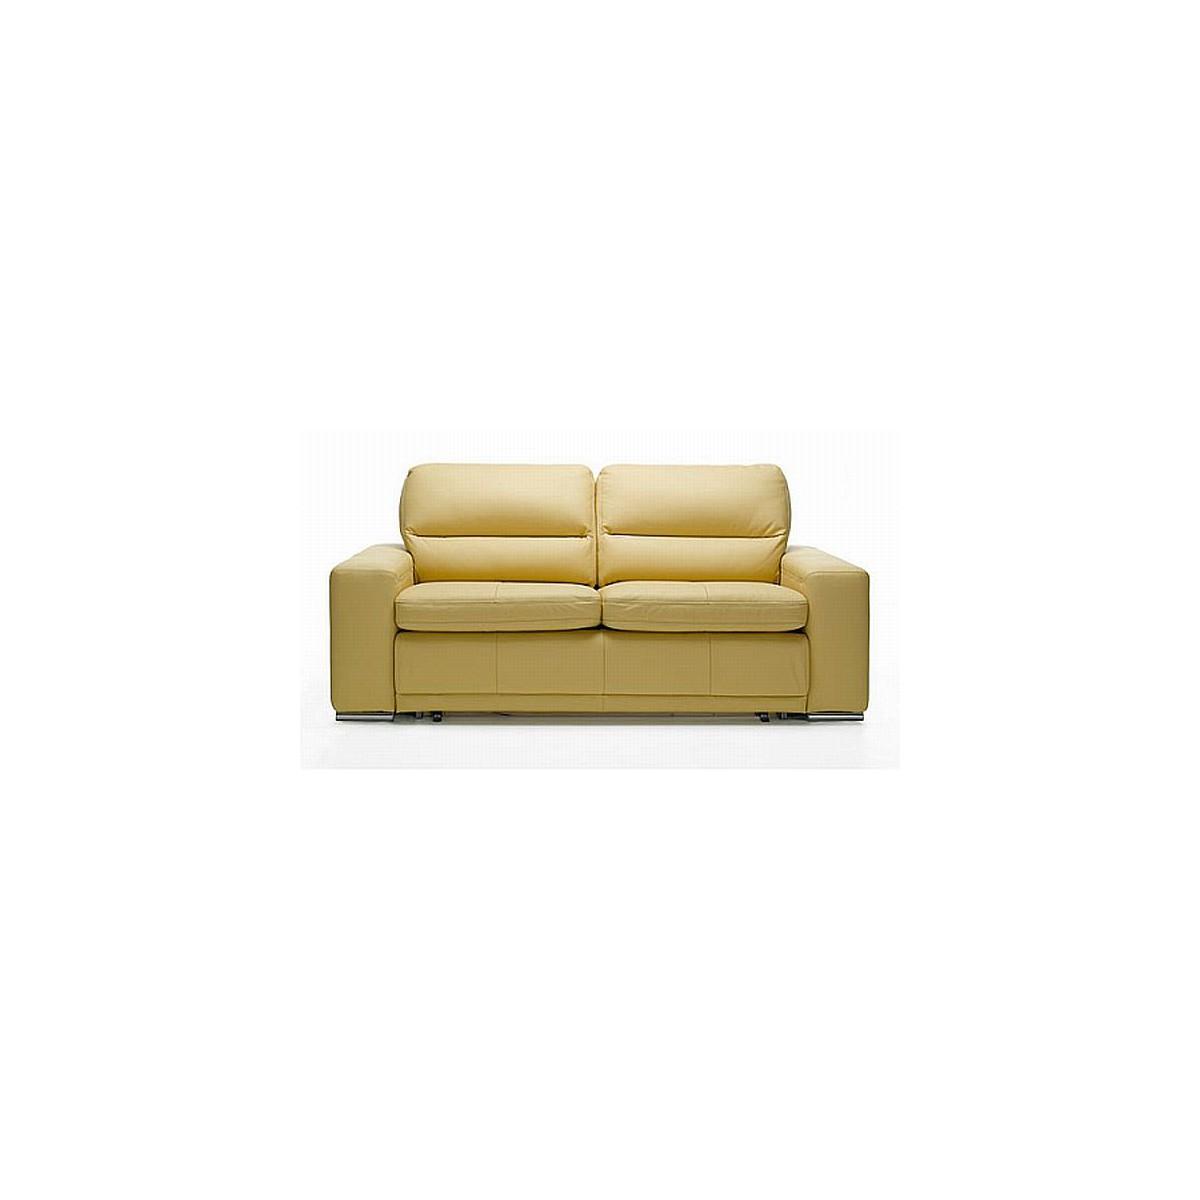 Bono Sofa 2F 160cm z funkcją spania